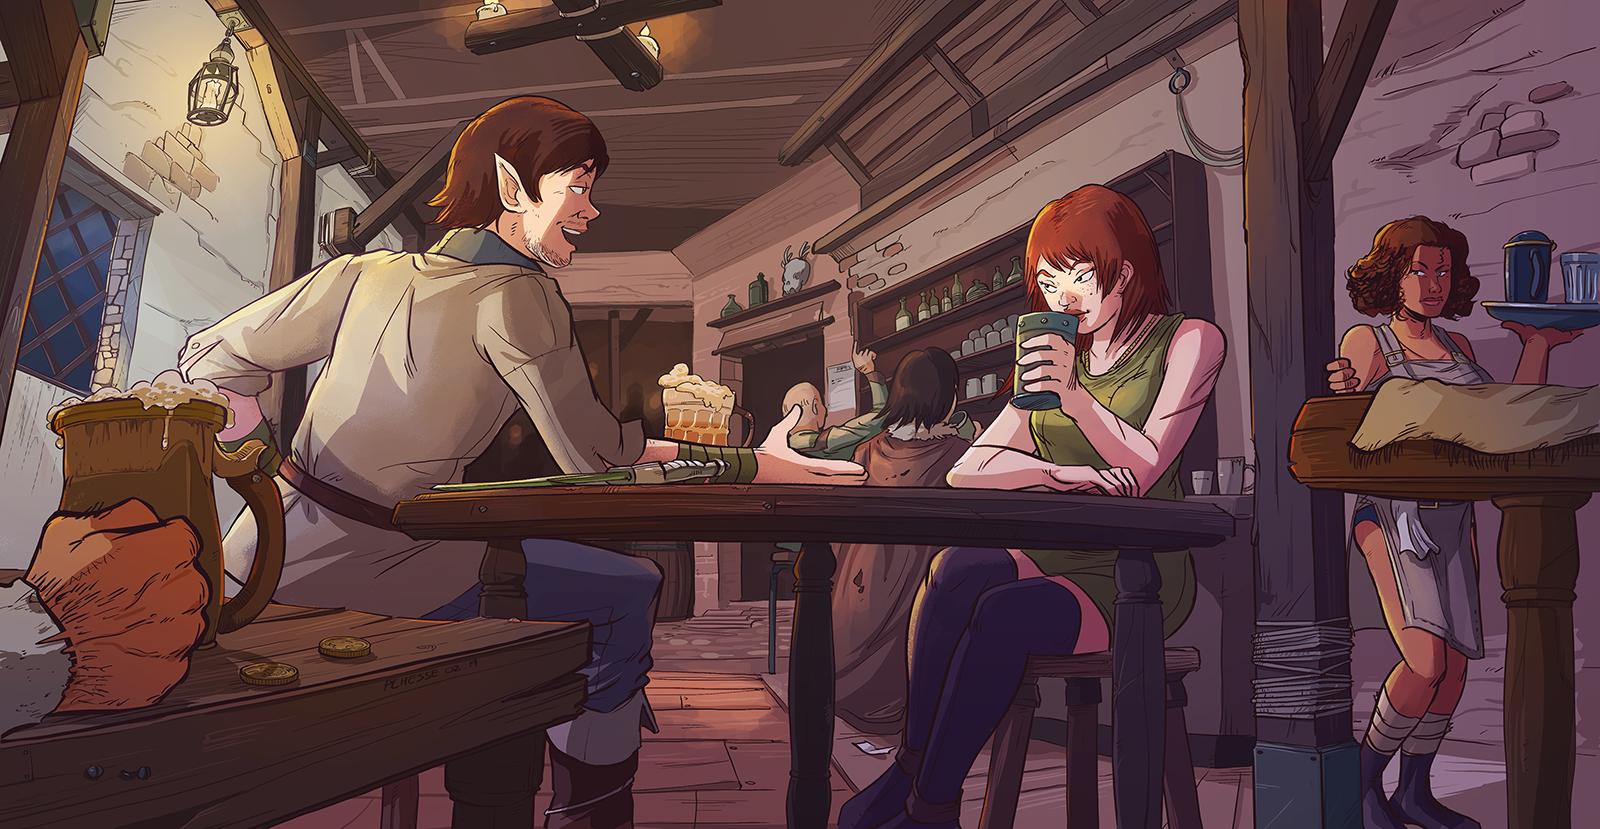 Commission - Bardik and Marina, Tavern Scene by Pehesse